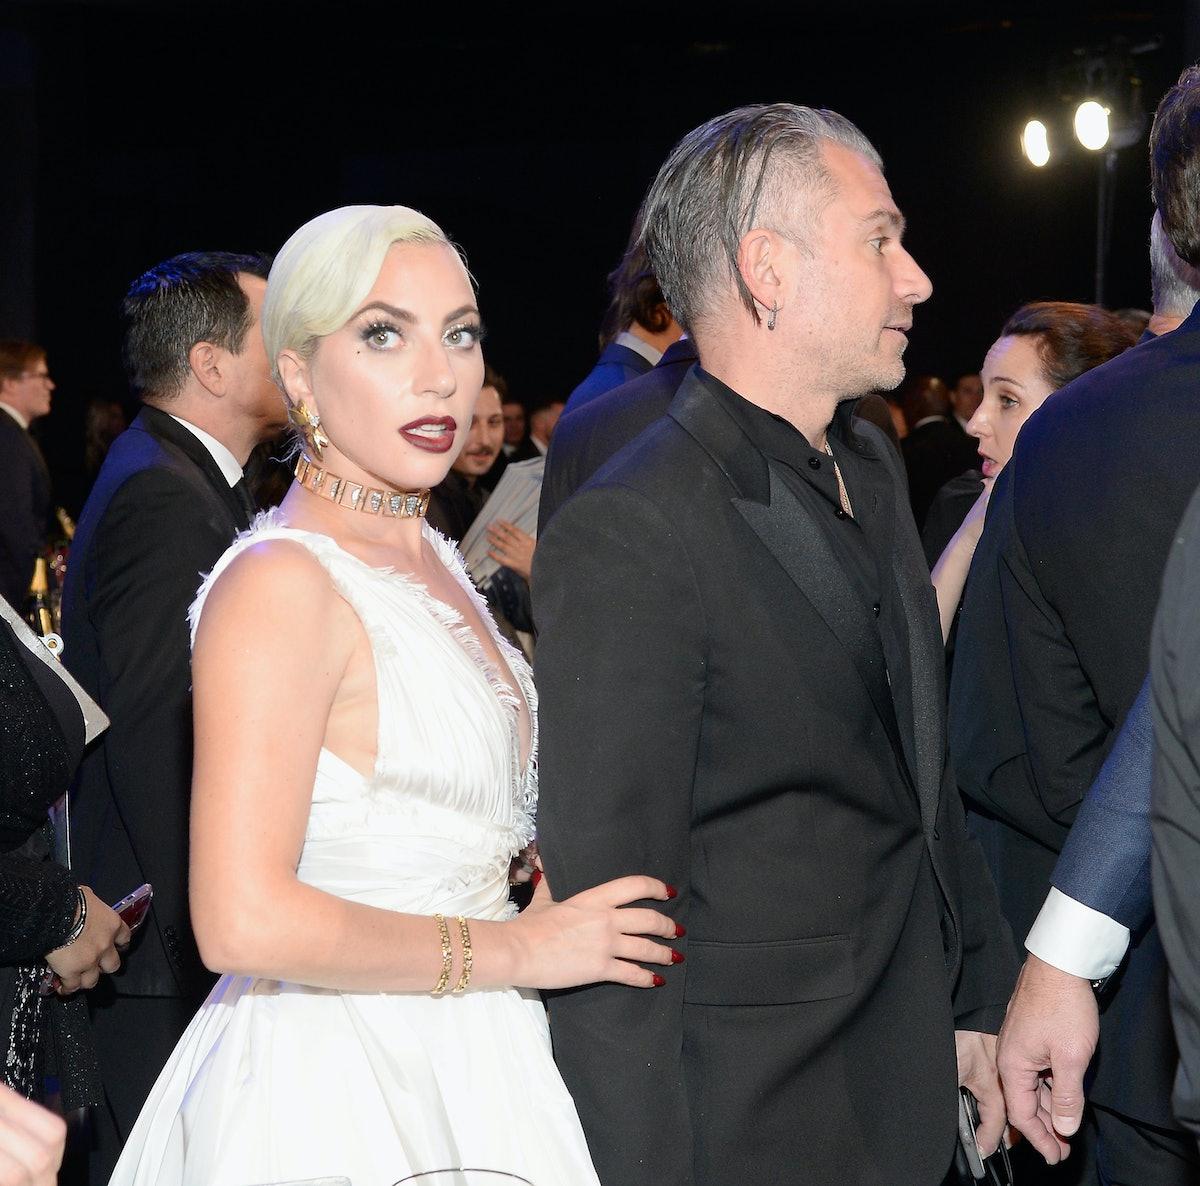 Did Lady Gaga & Christian Carino Break Up? These Rumors Are Really Sad